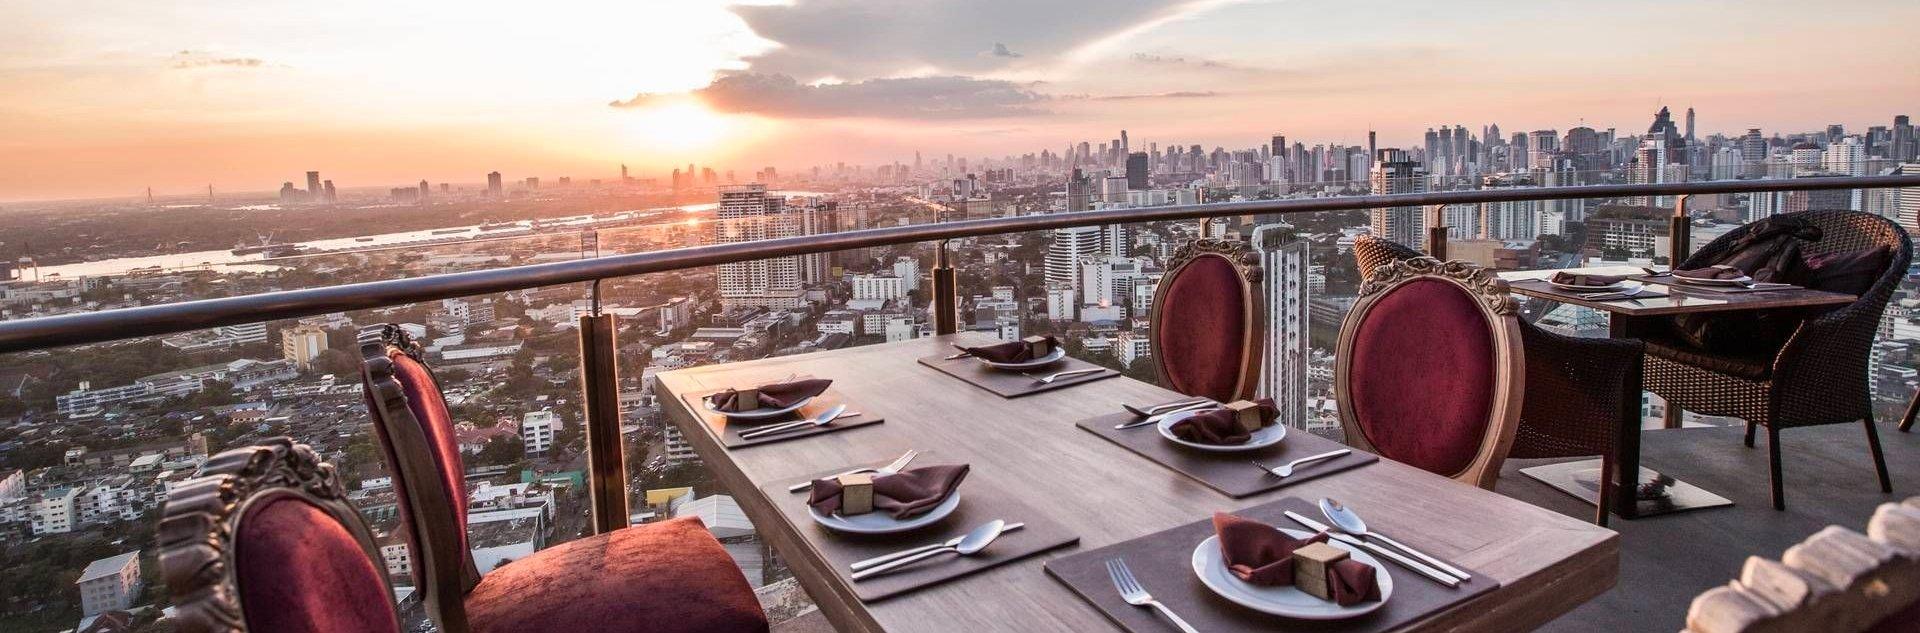 rooftop restaurant cielo à bangkok